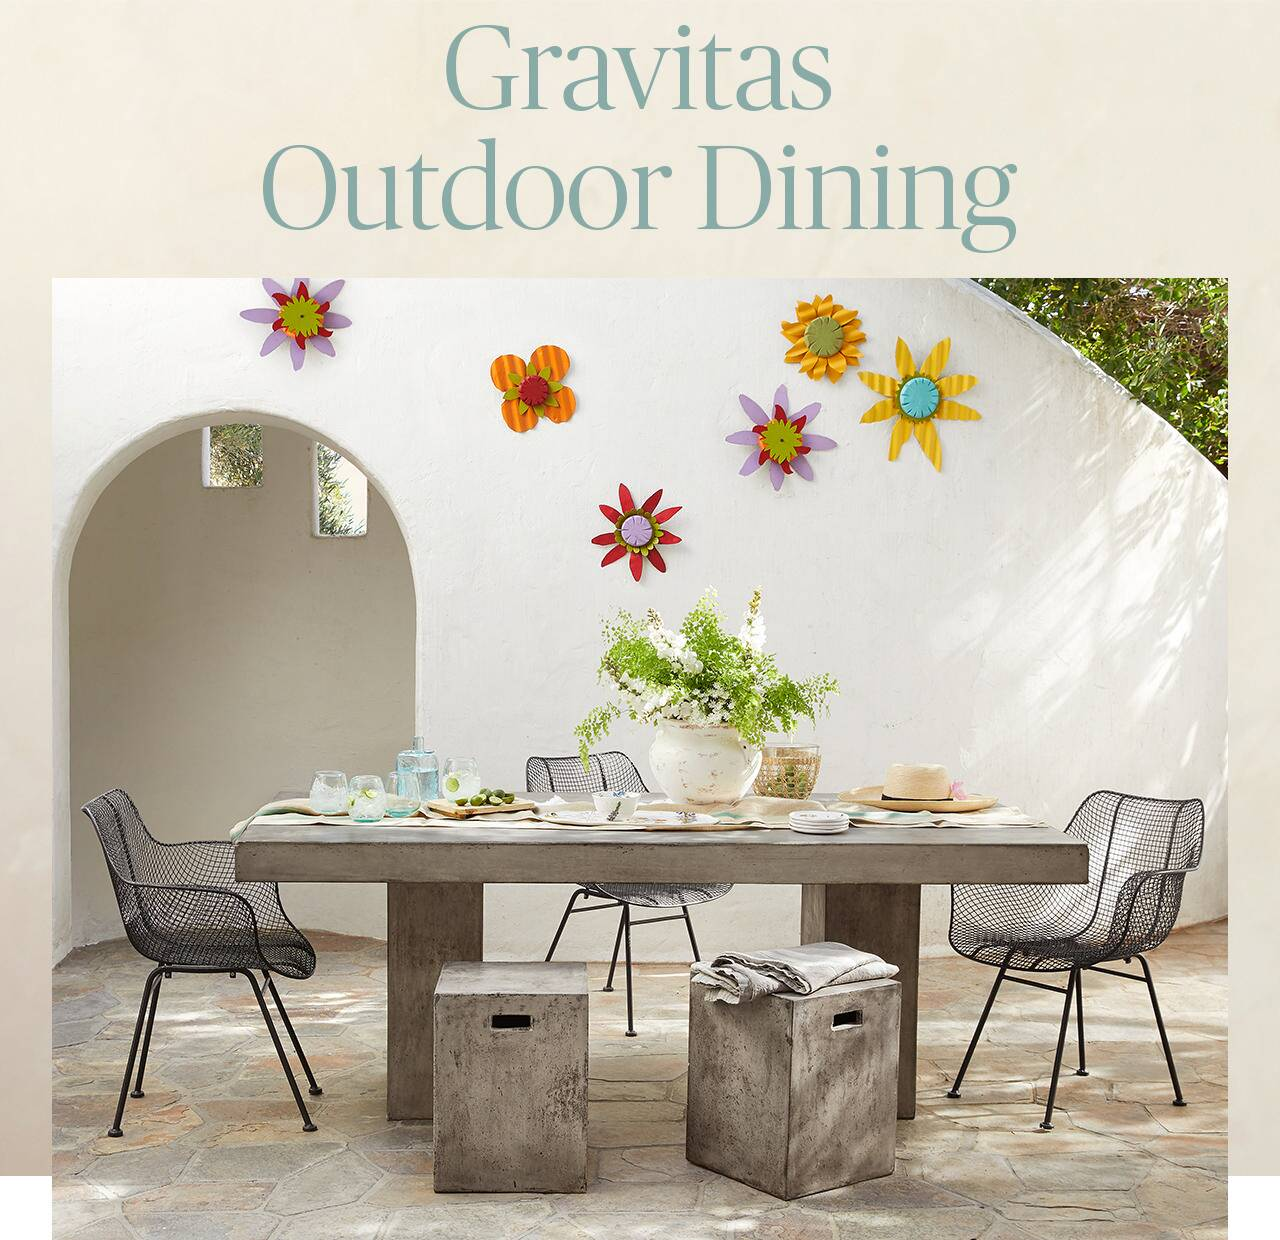 Gravitas Outdoor Dining